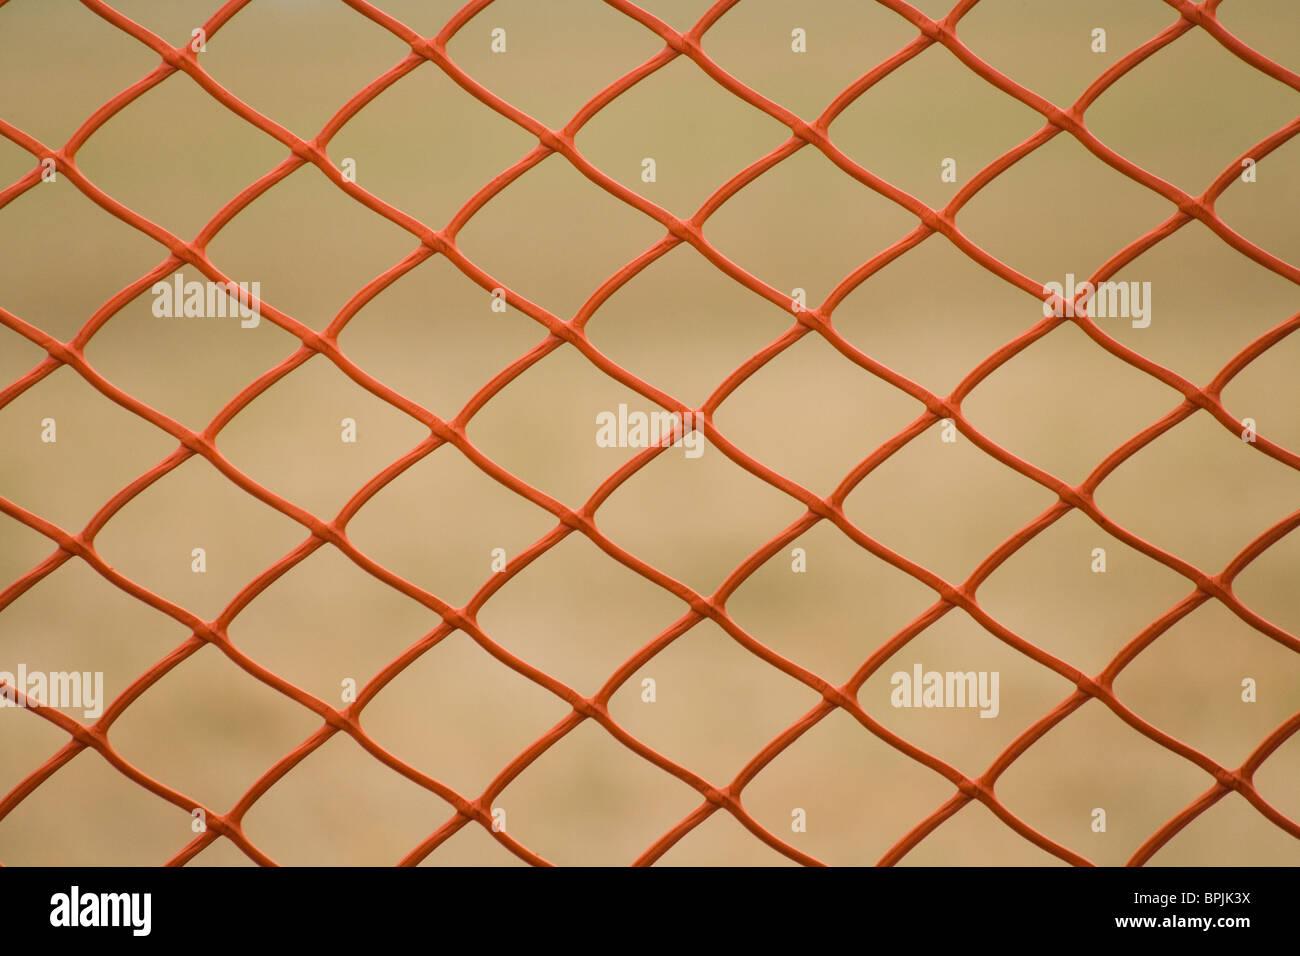 Yellow Netting close up shot - Stock Image